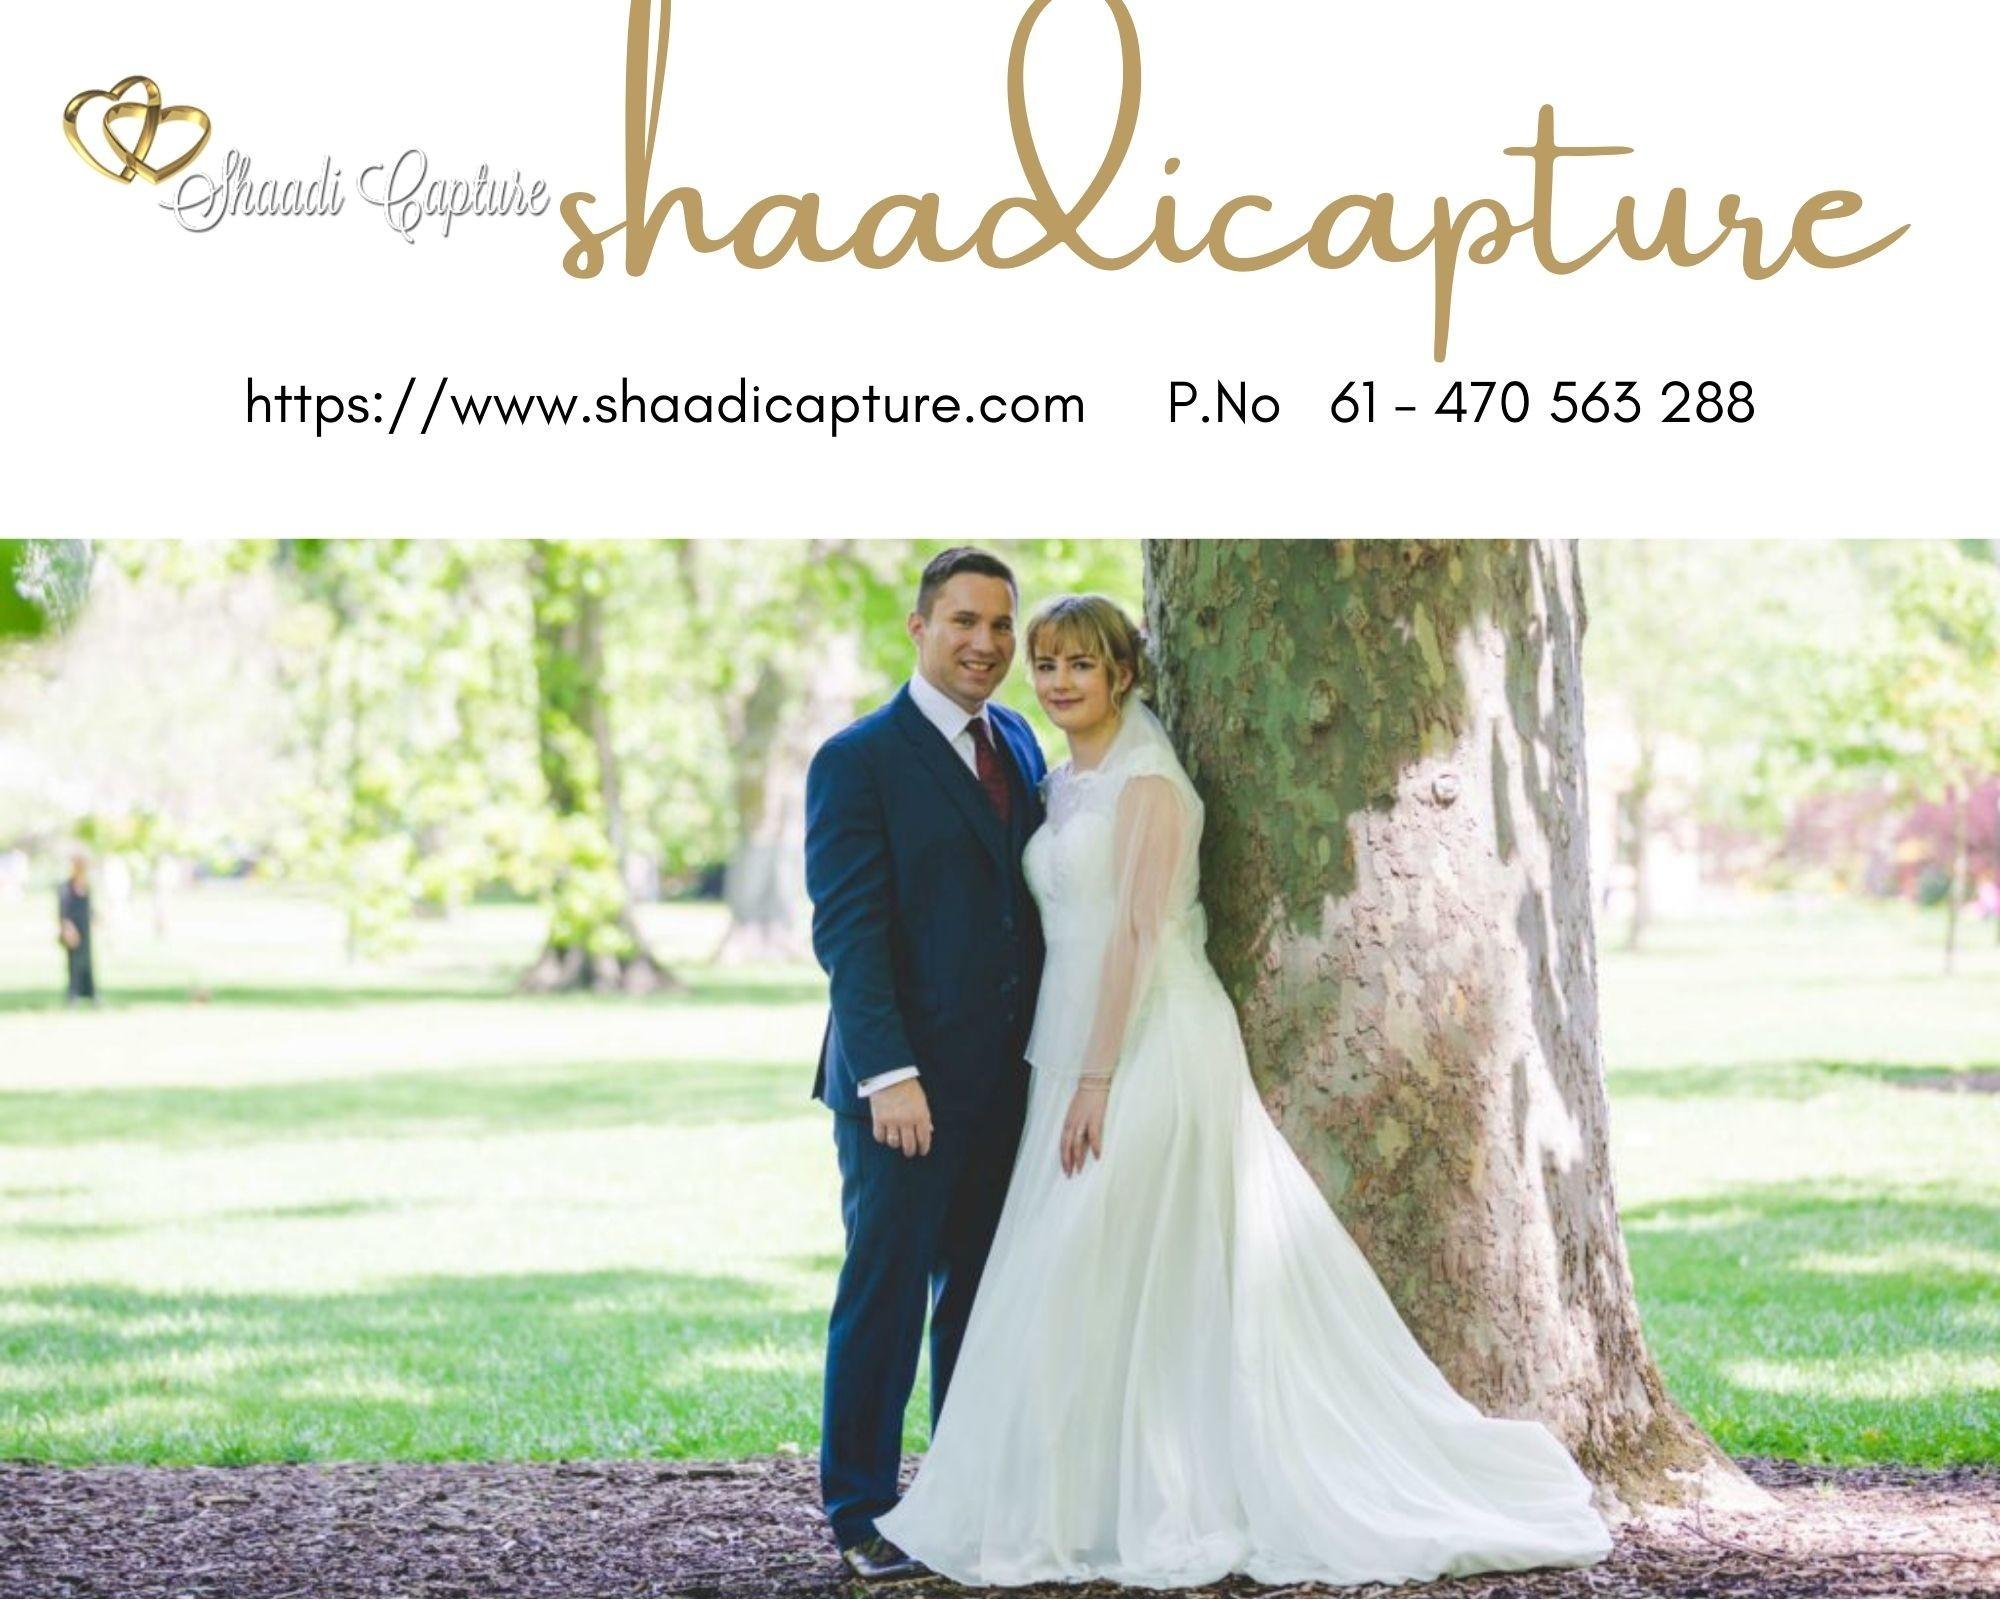 Top wedding photographer Melbourne 2020